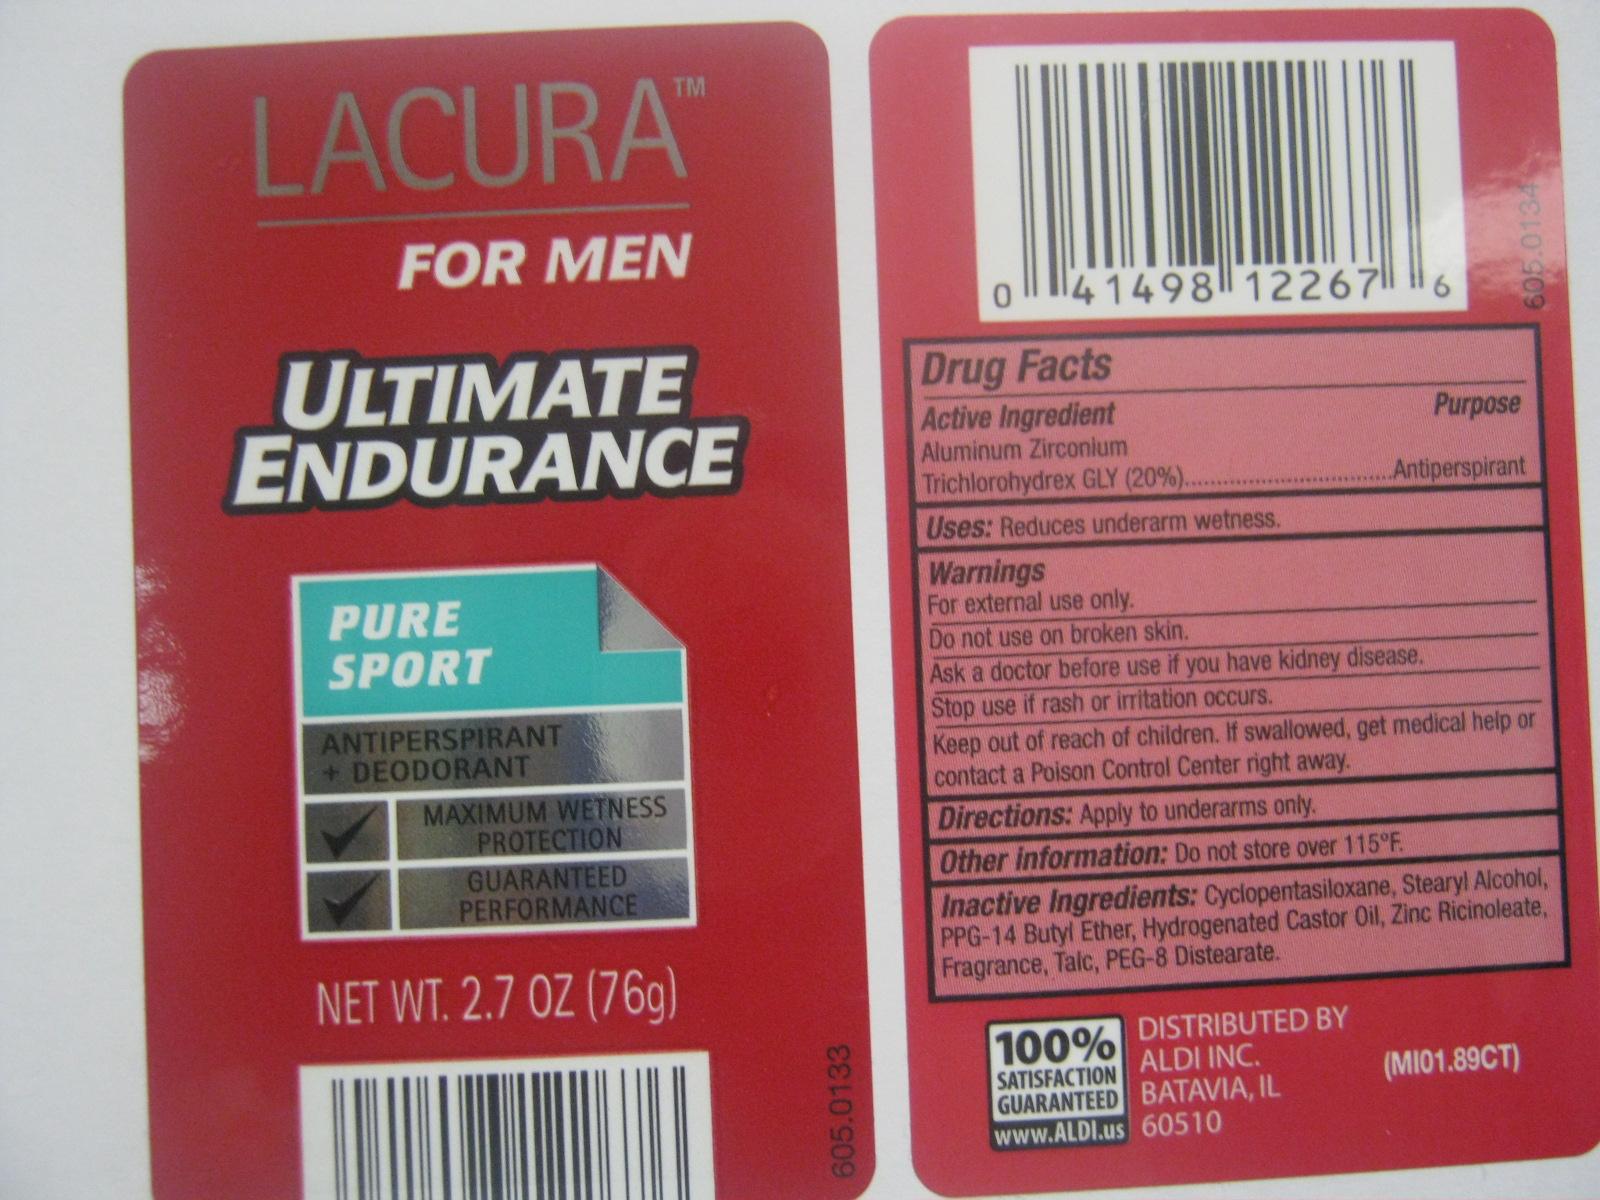 Lacura Ultimate Endurance Pure Sport Anti-perspirant Deodorant (Aluminum Zirconium Trichlorohydrex Gly) Stick [Vvf Kansas Services Llc]